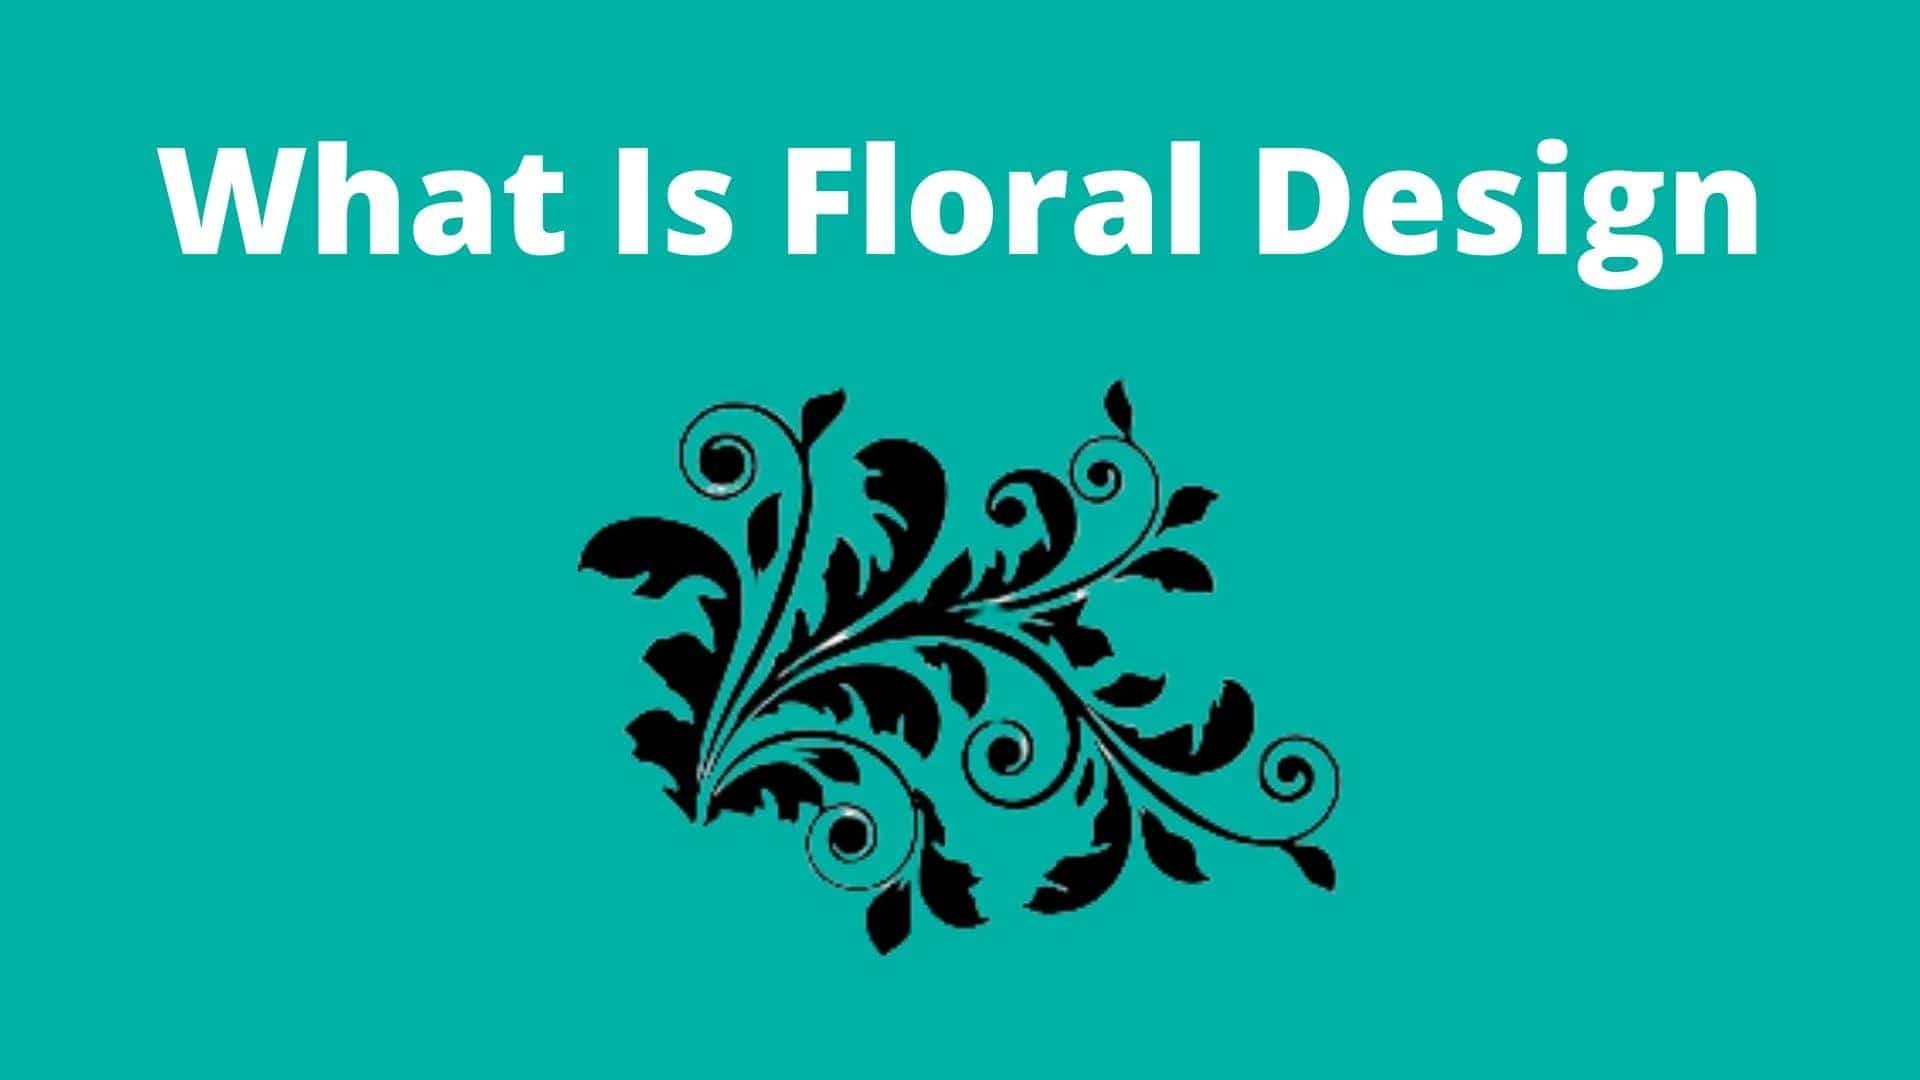 Floral Design - Florist